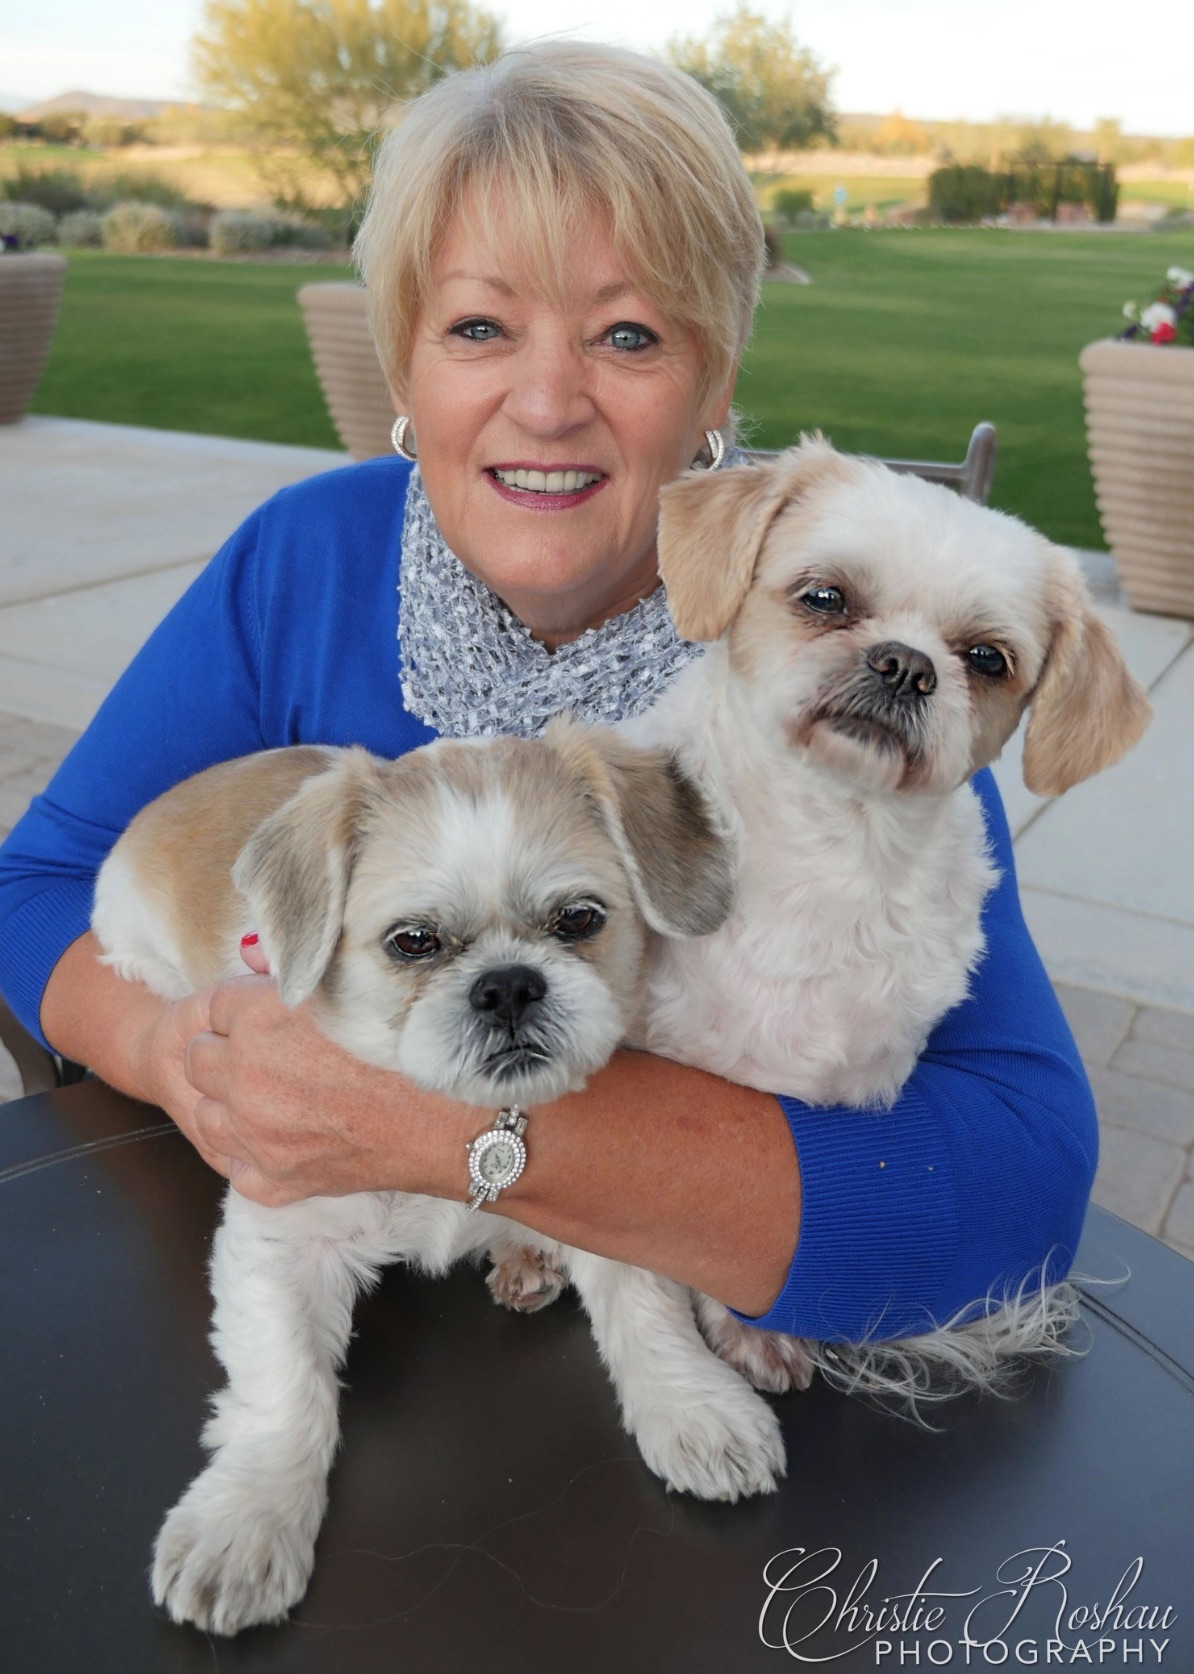 Pet Photography –Christie Roshau-Lukes Photography.jpg